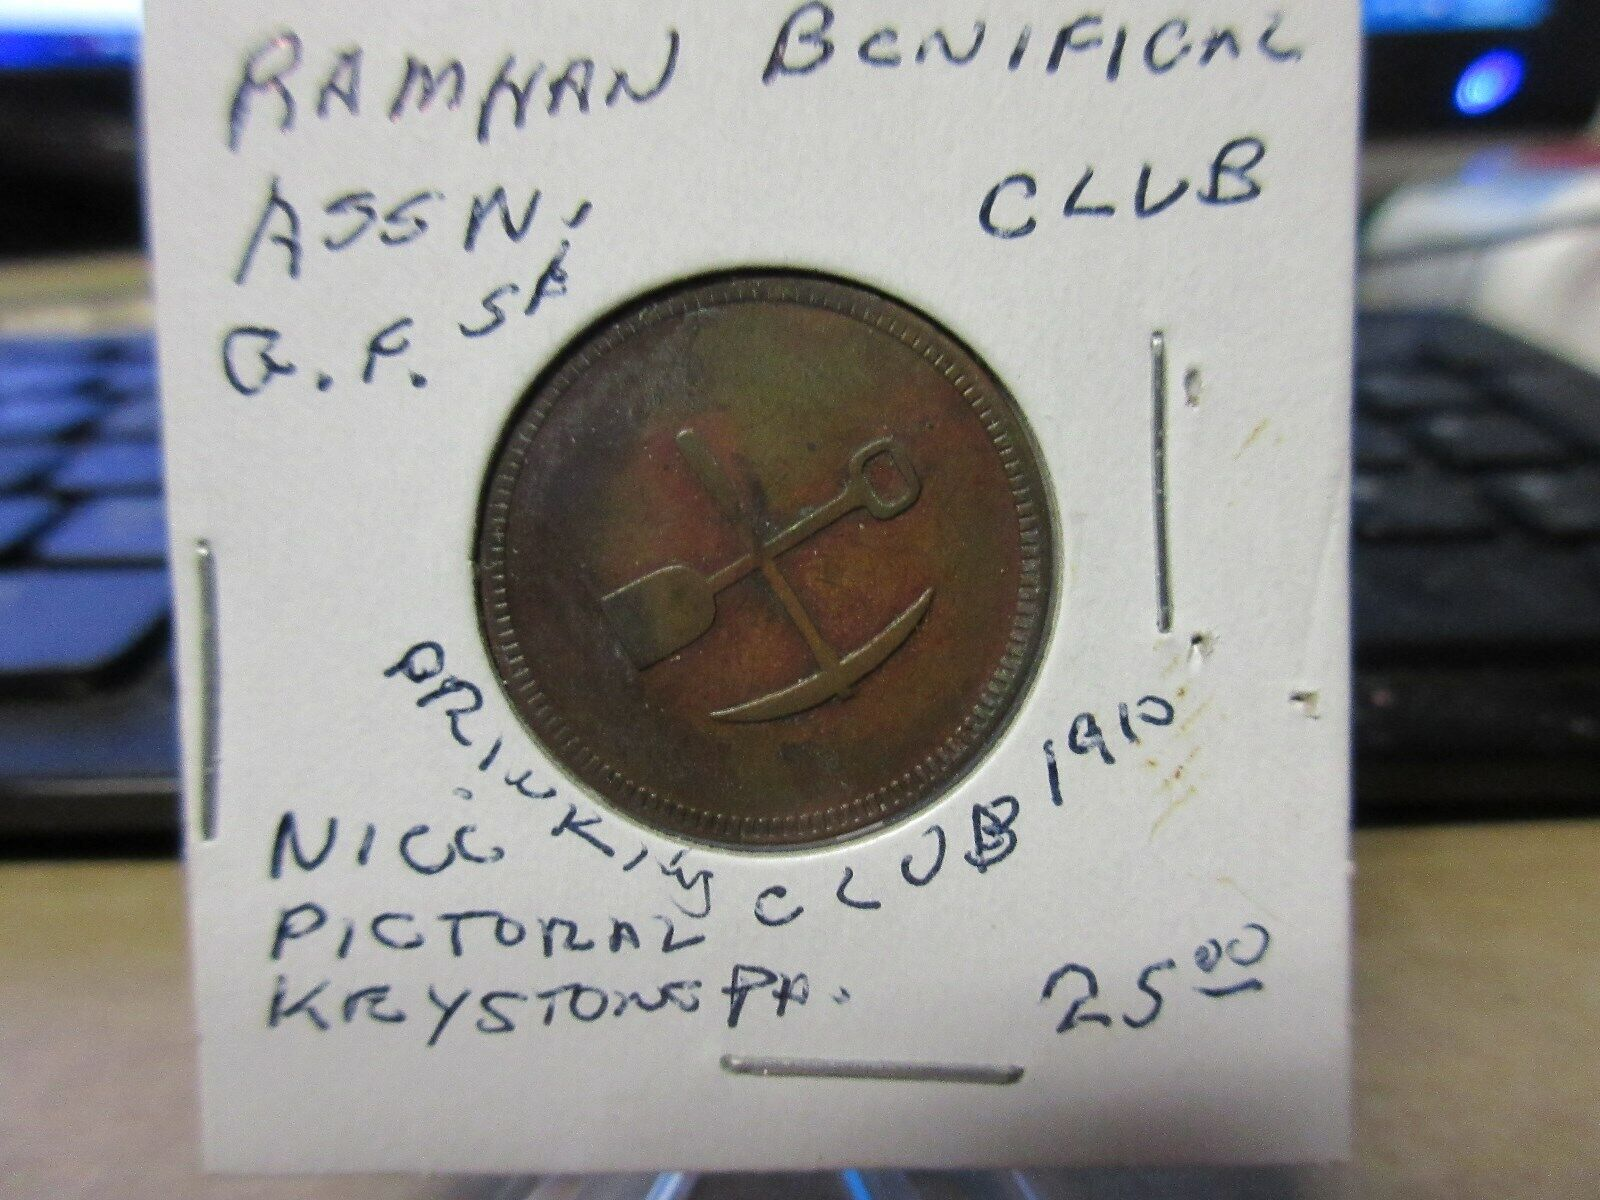 PA / Raman Beneficial Association Club GF 5 Token Copper 24 Mm - $14.95